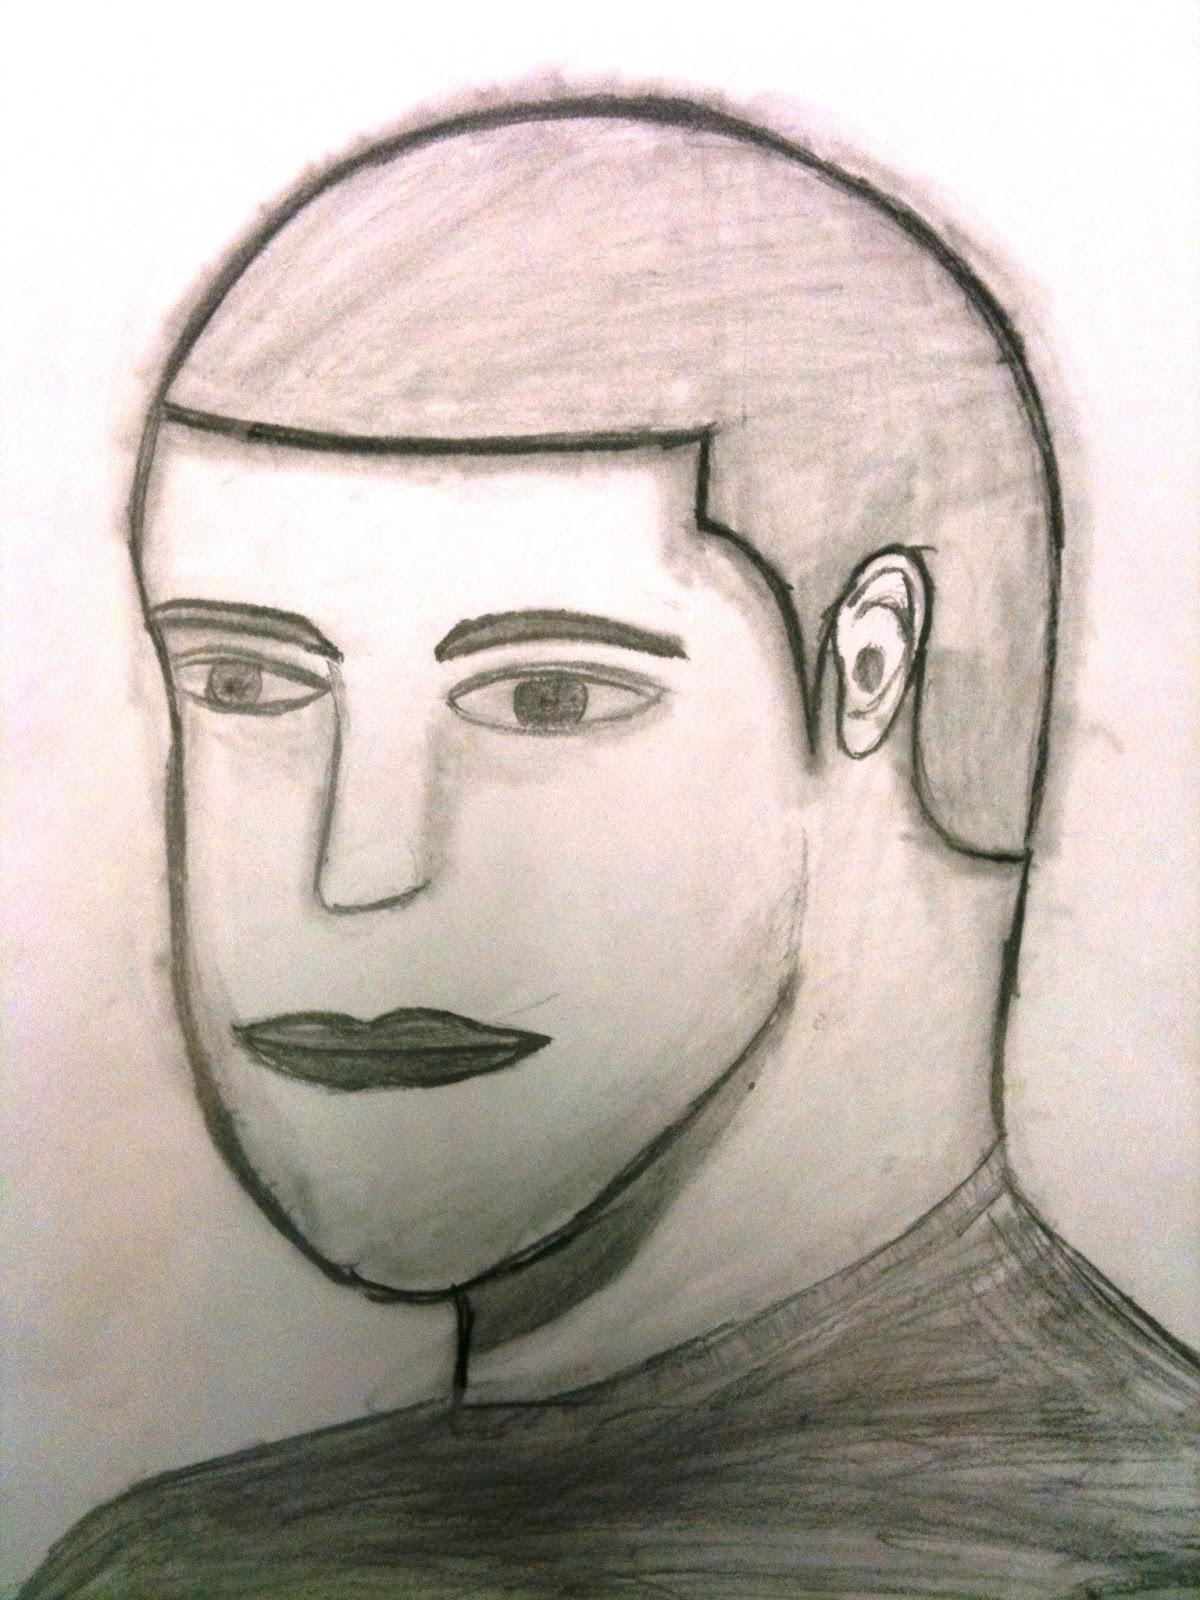 1200x1600 Pencil Drawing Of Human Portrait Drawn Portrait Human Face